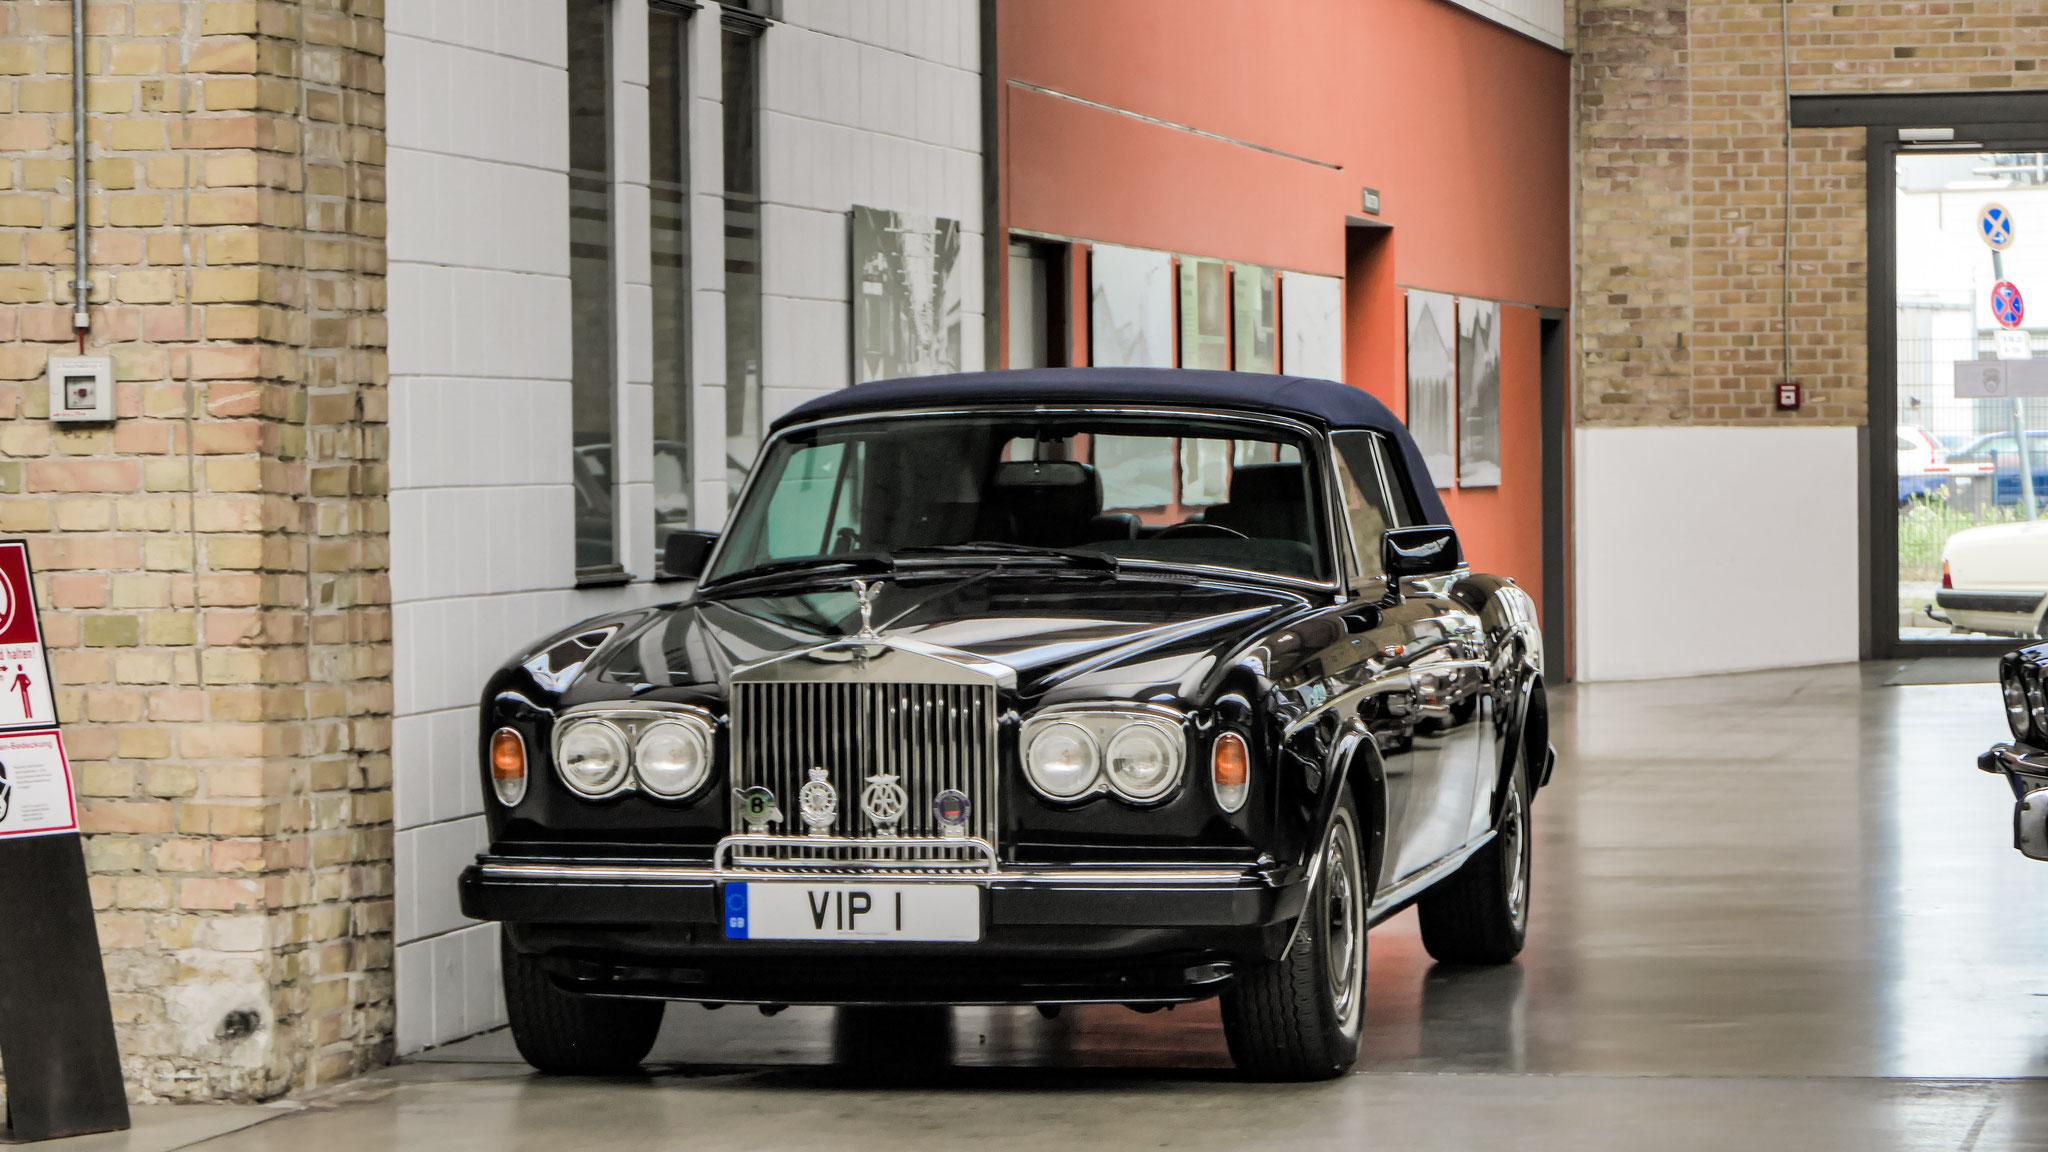 Rolls Royce Corniche - VIP-1 (GB)